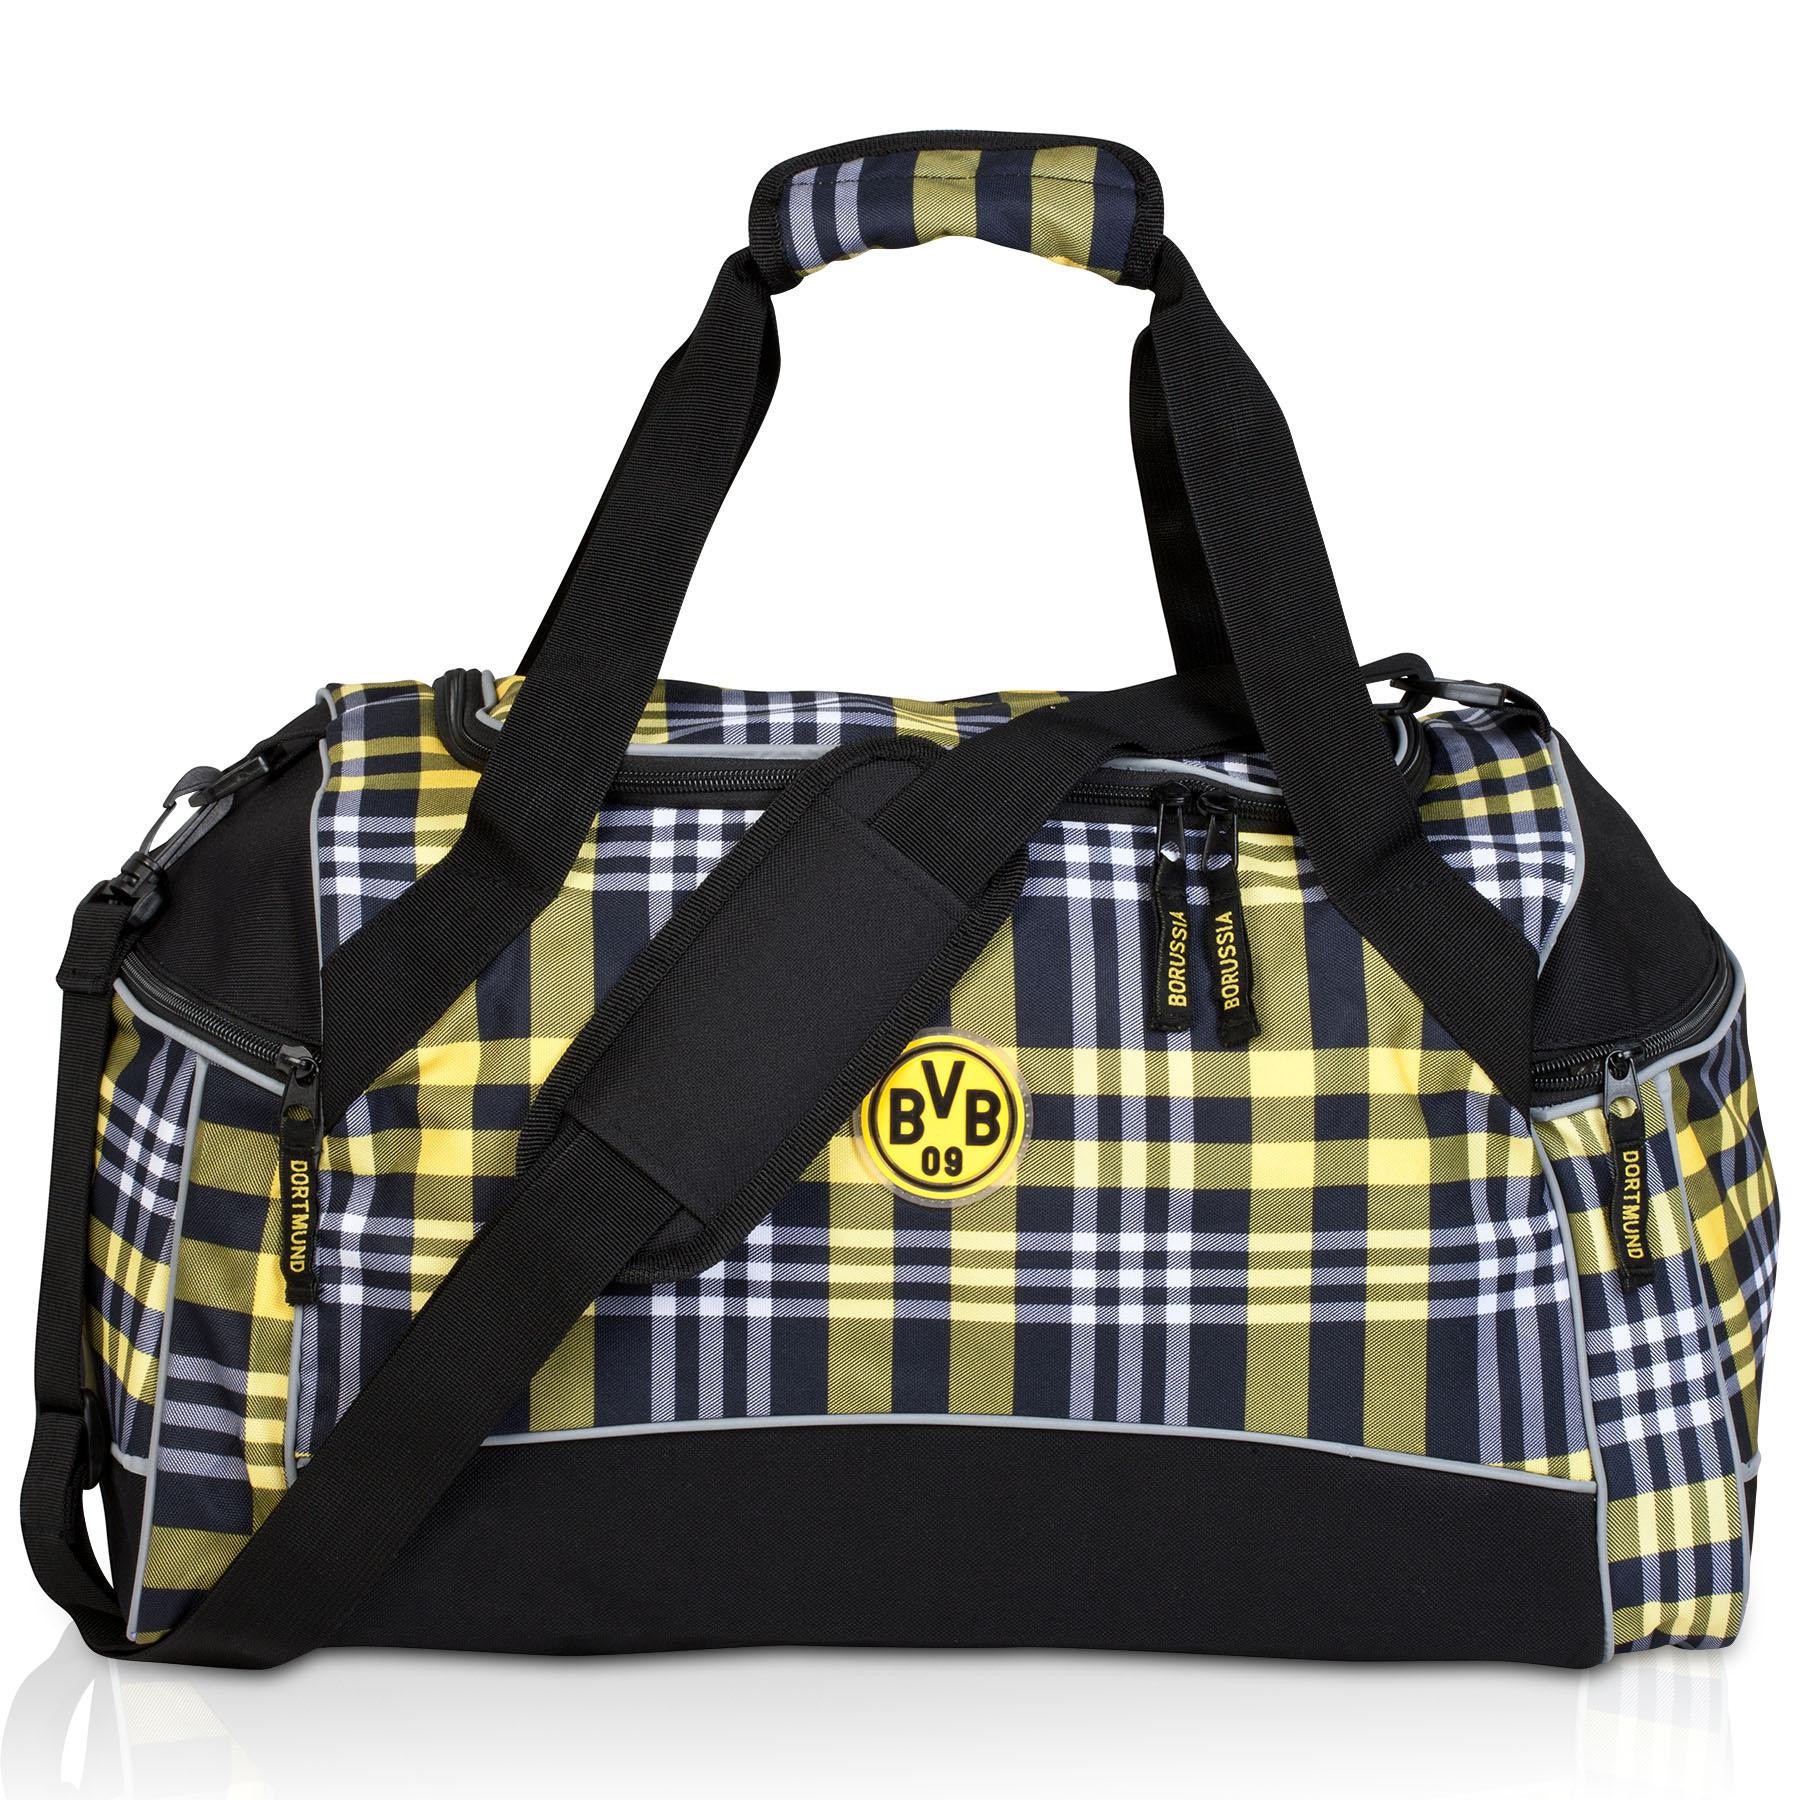 BVB Plaid Sports Bag